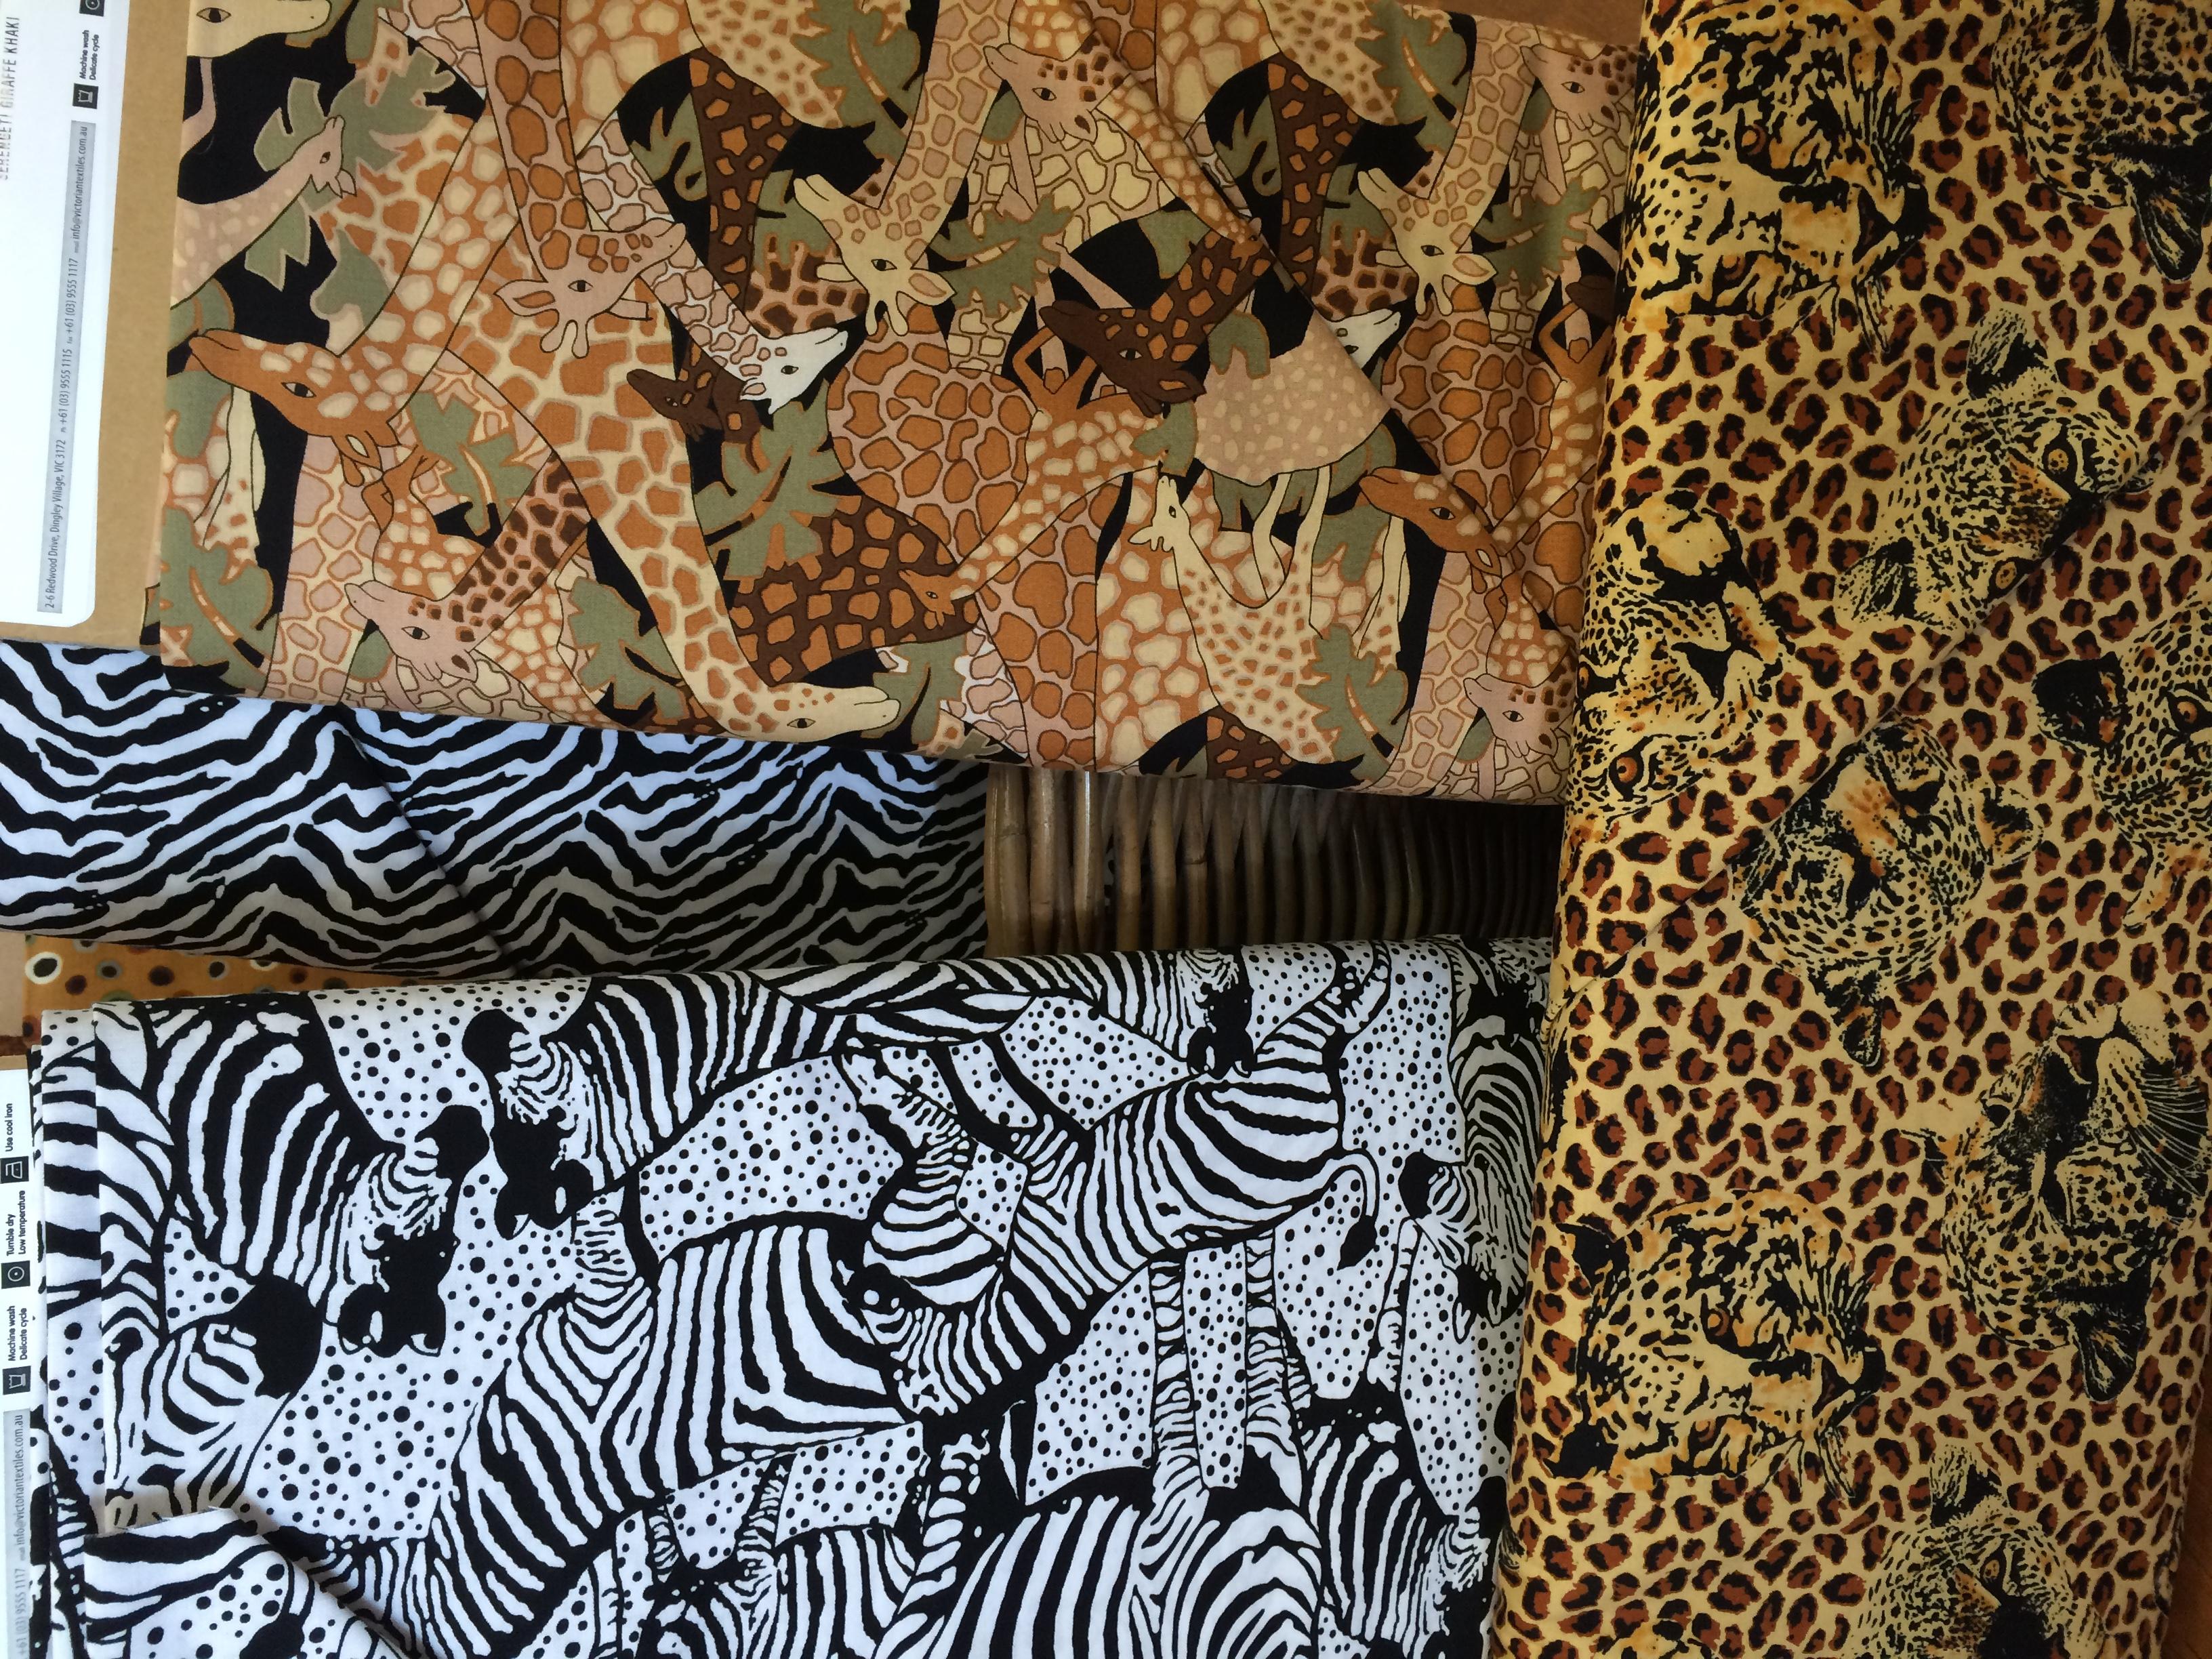 serengeti prints